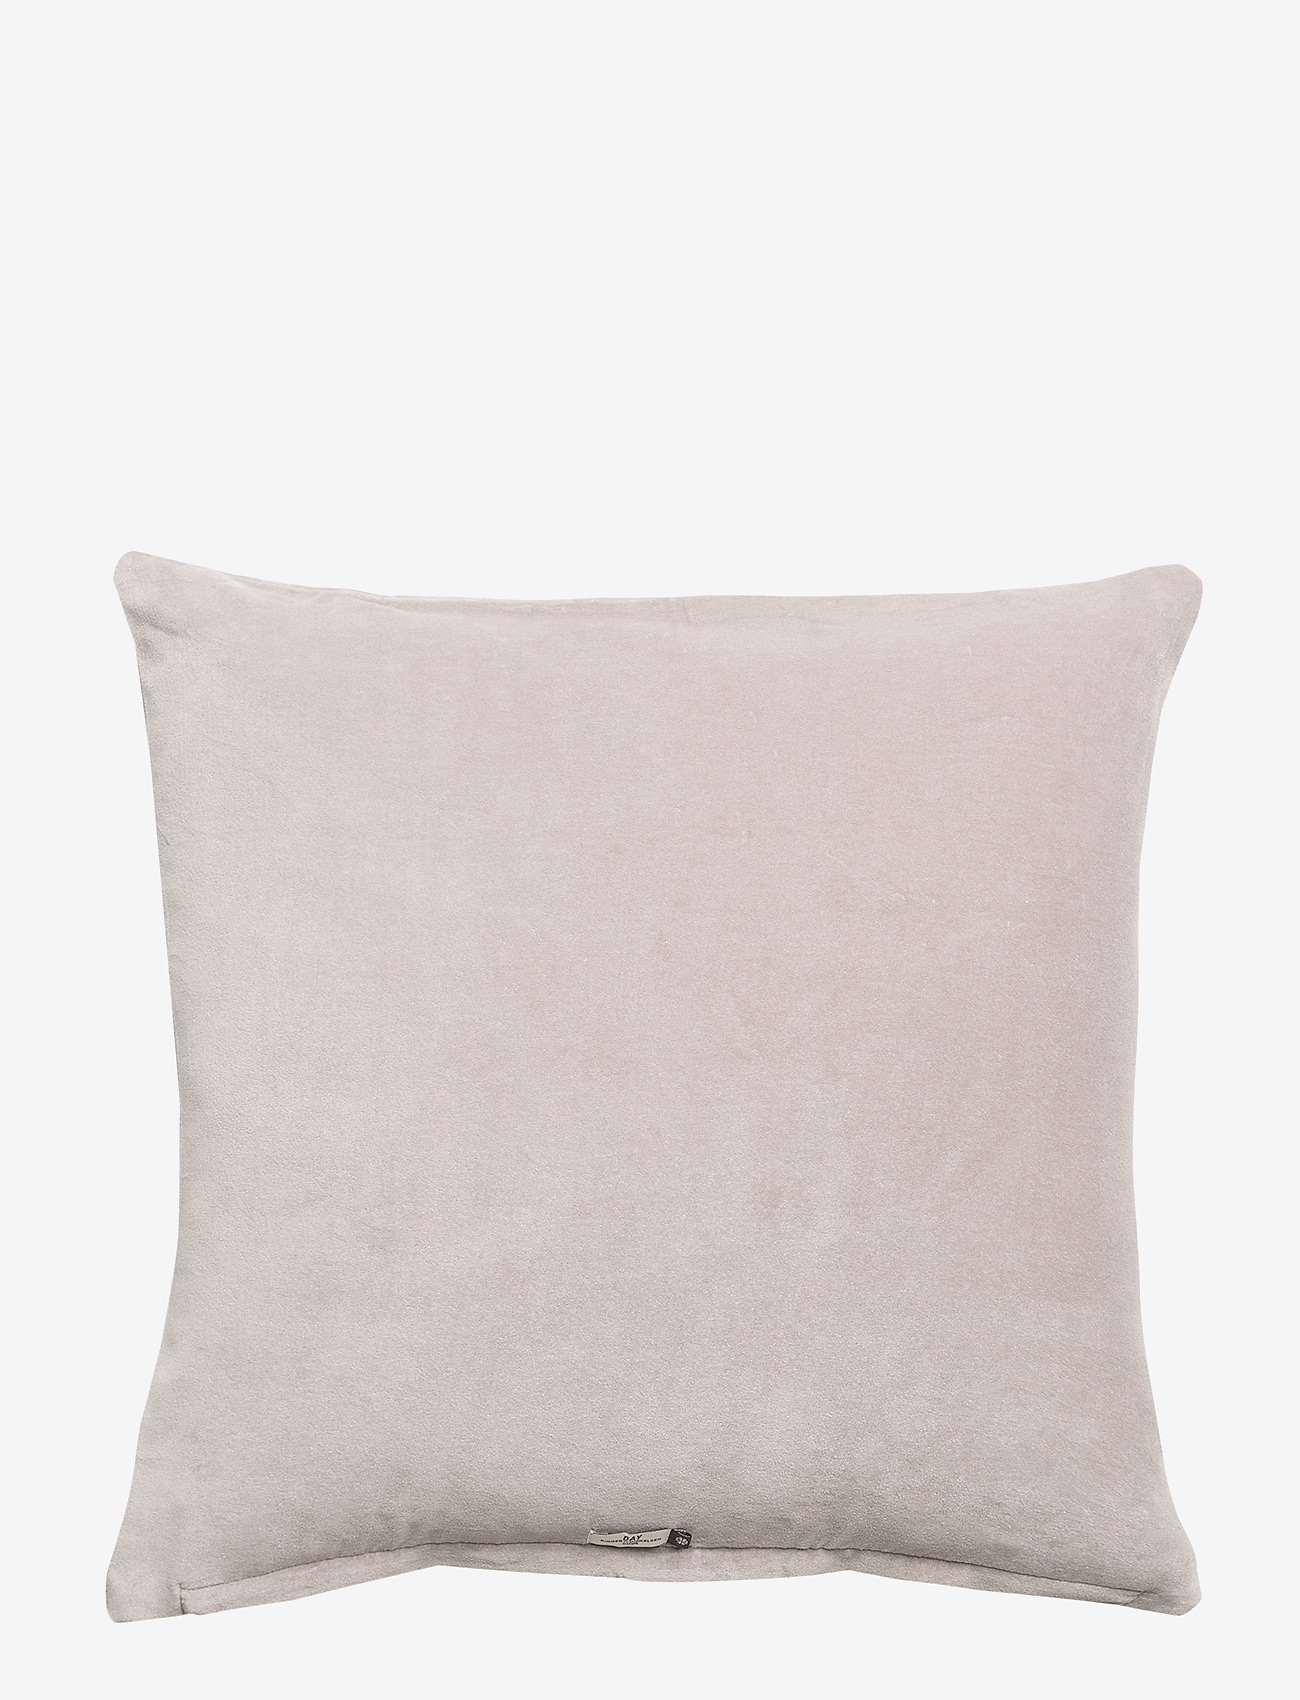 DAY Home  Day Velveto Cushion Cover - Wohnzimmer